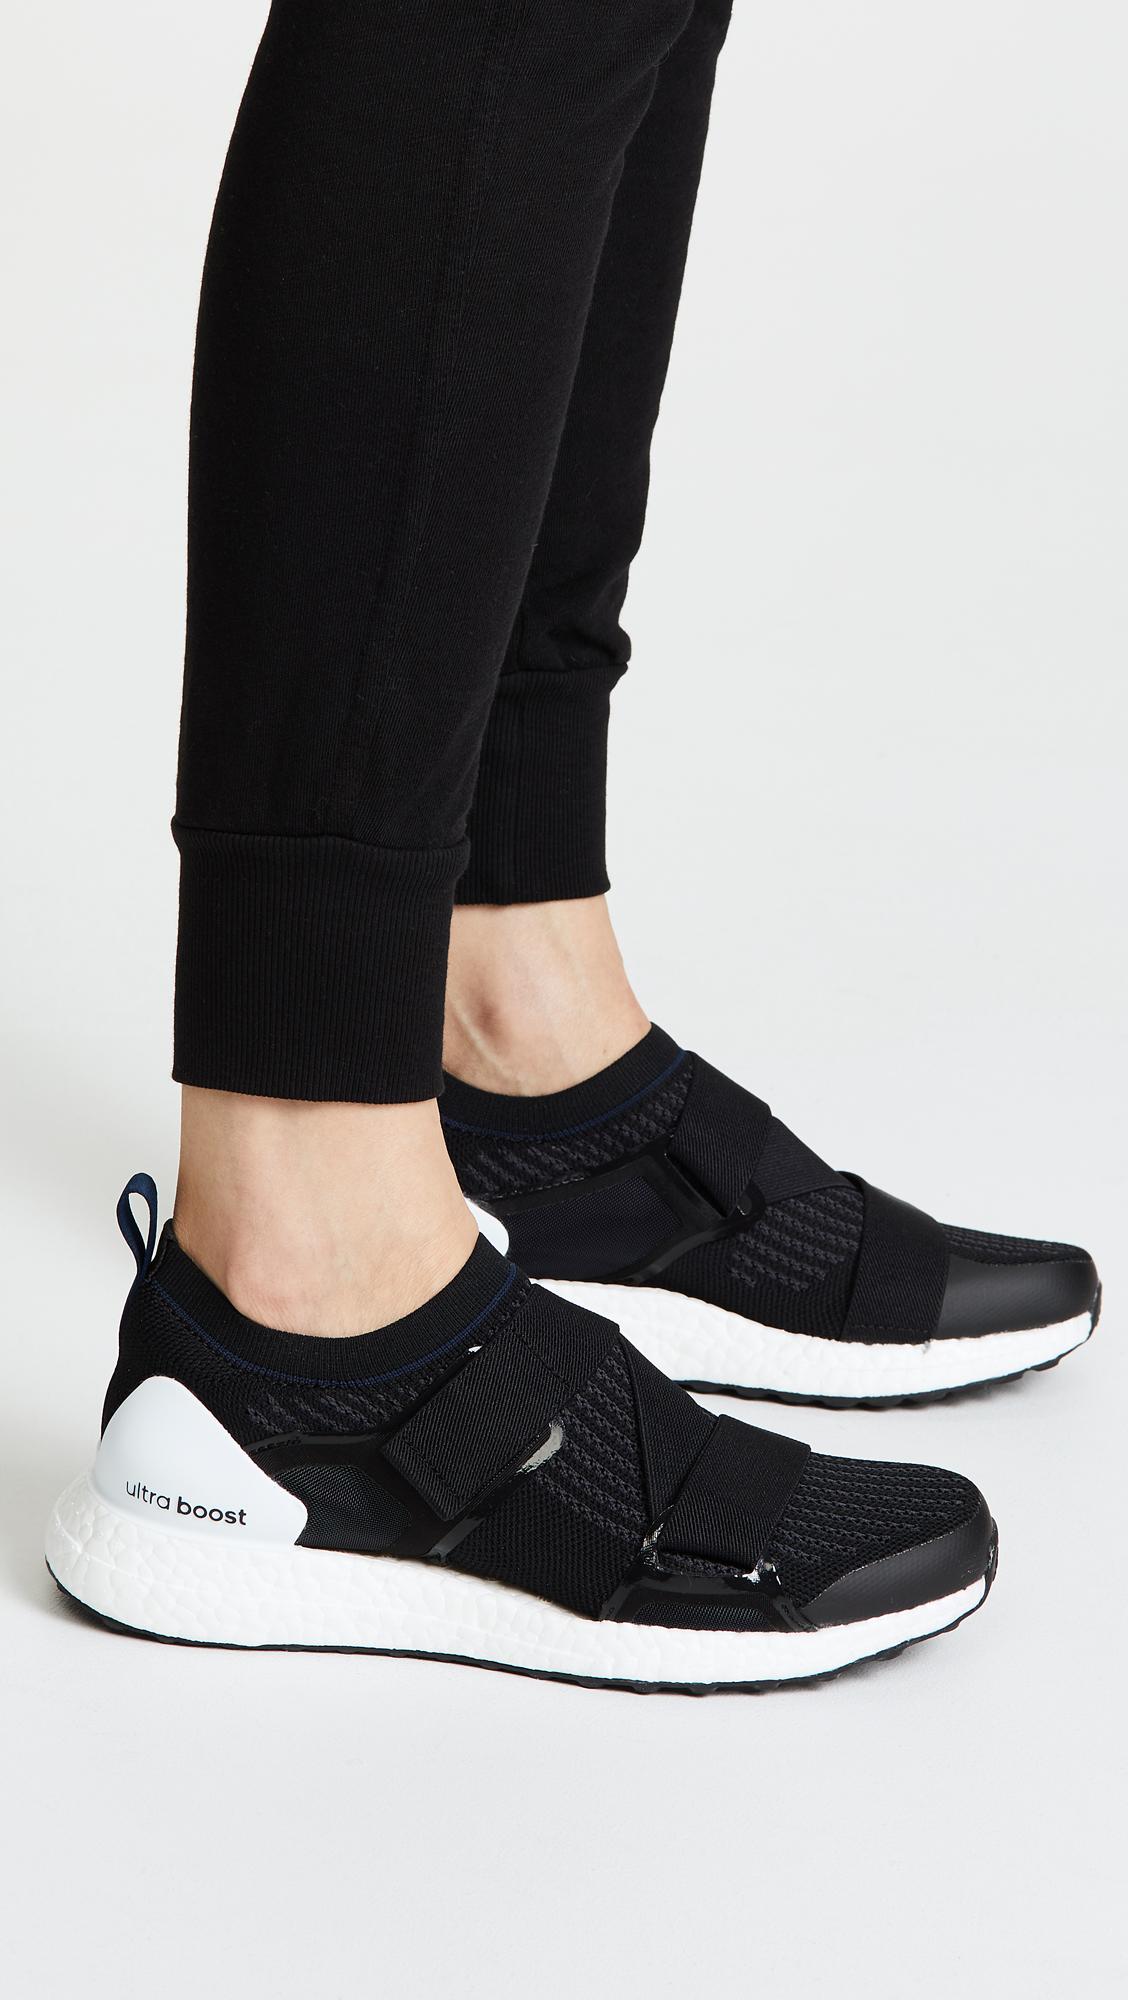 the latest 7cda4 a1e64 adidas by Stella McCartney UltraBOOST X Sneakers  SHOPBOP